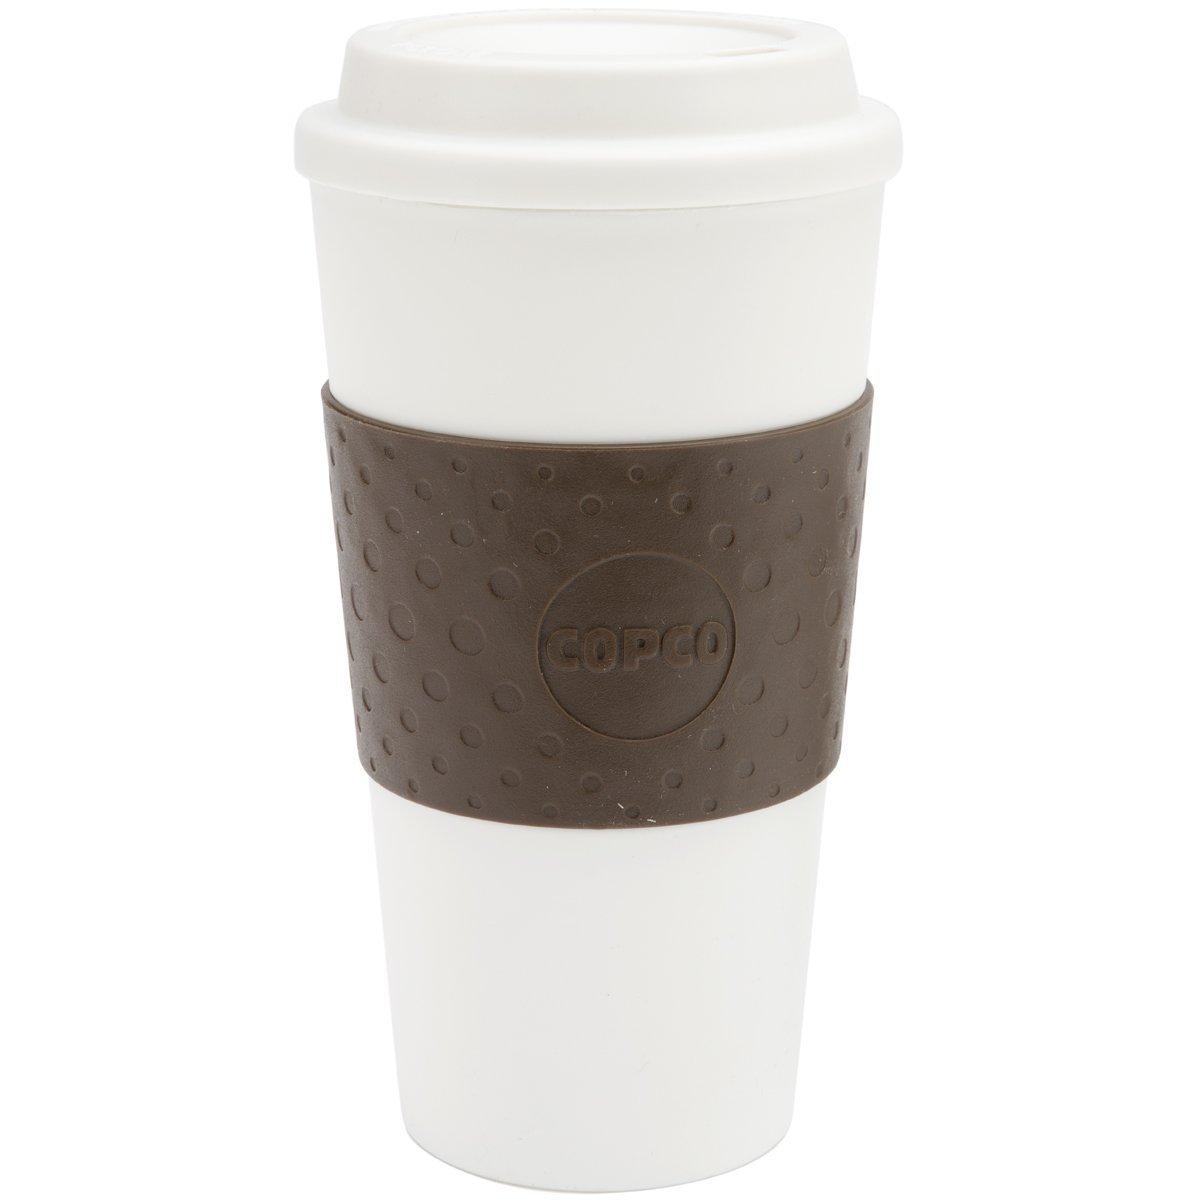 Copco 16-Ounce Capacity Acadia Reusable To Go Mug, Blue 2510-9966B